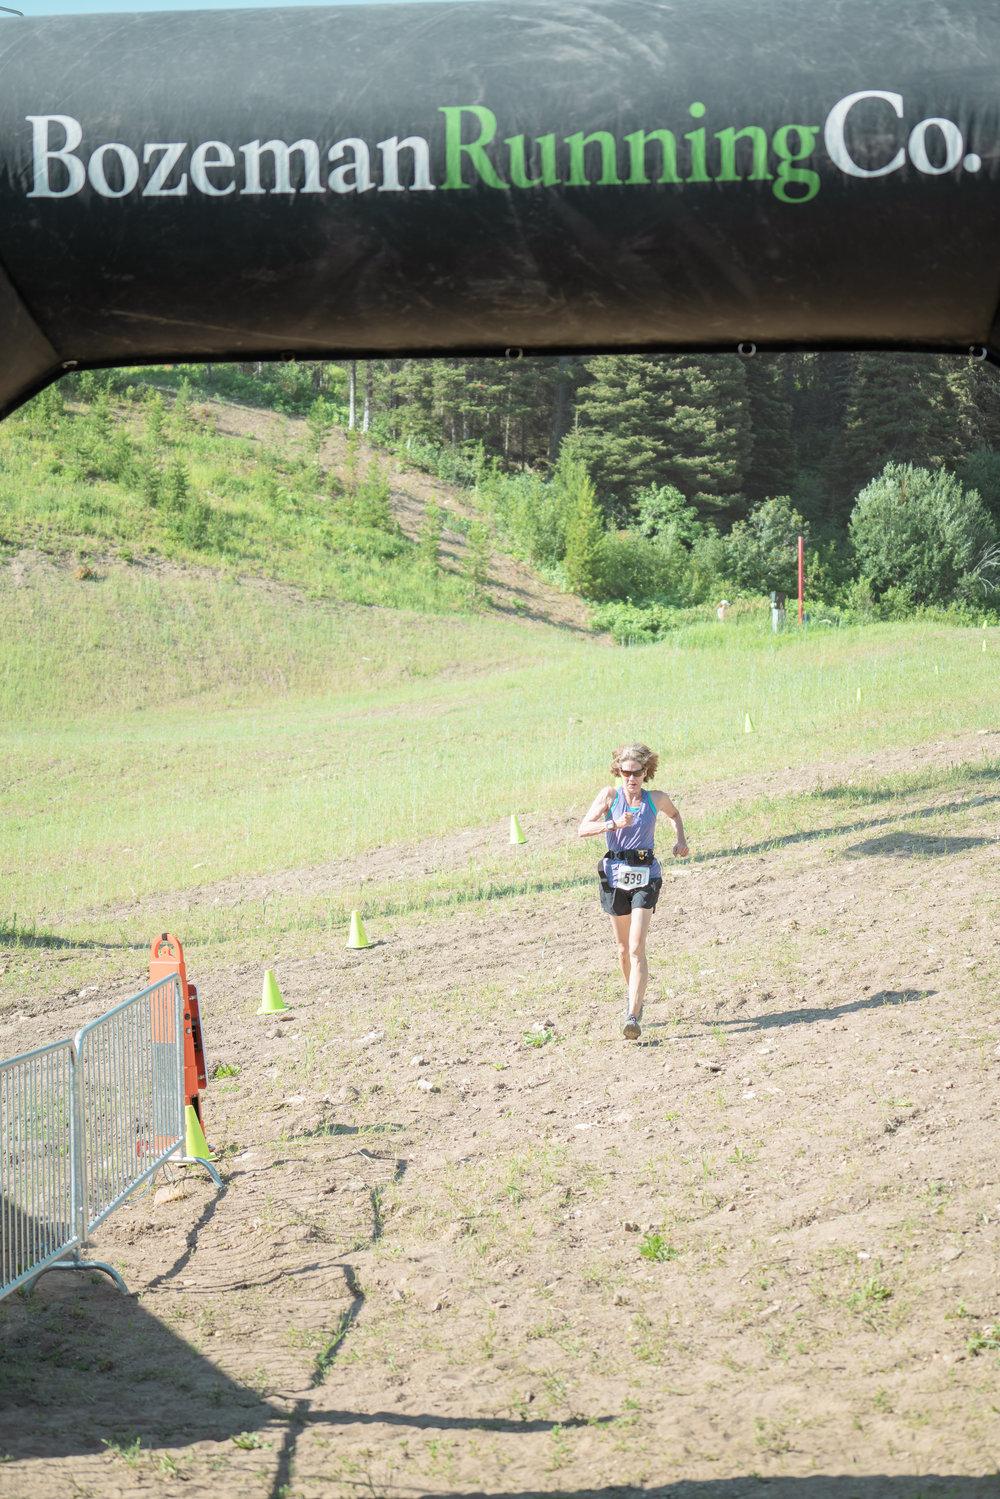 A runner finishing at Bozeman Running Co. racing of Crosscuts at Bridger Bowl just north of Bozeman, Montana.